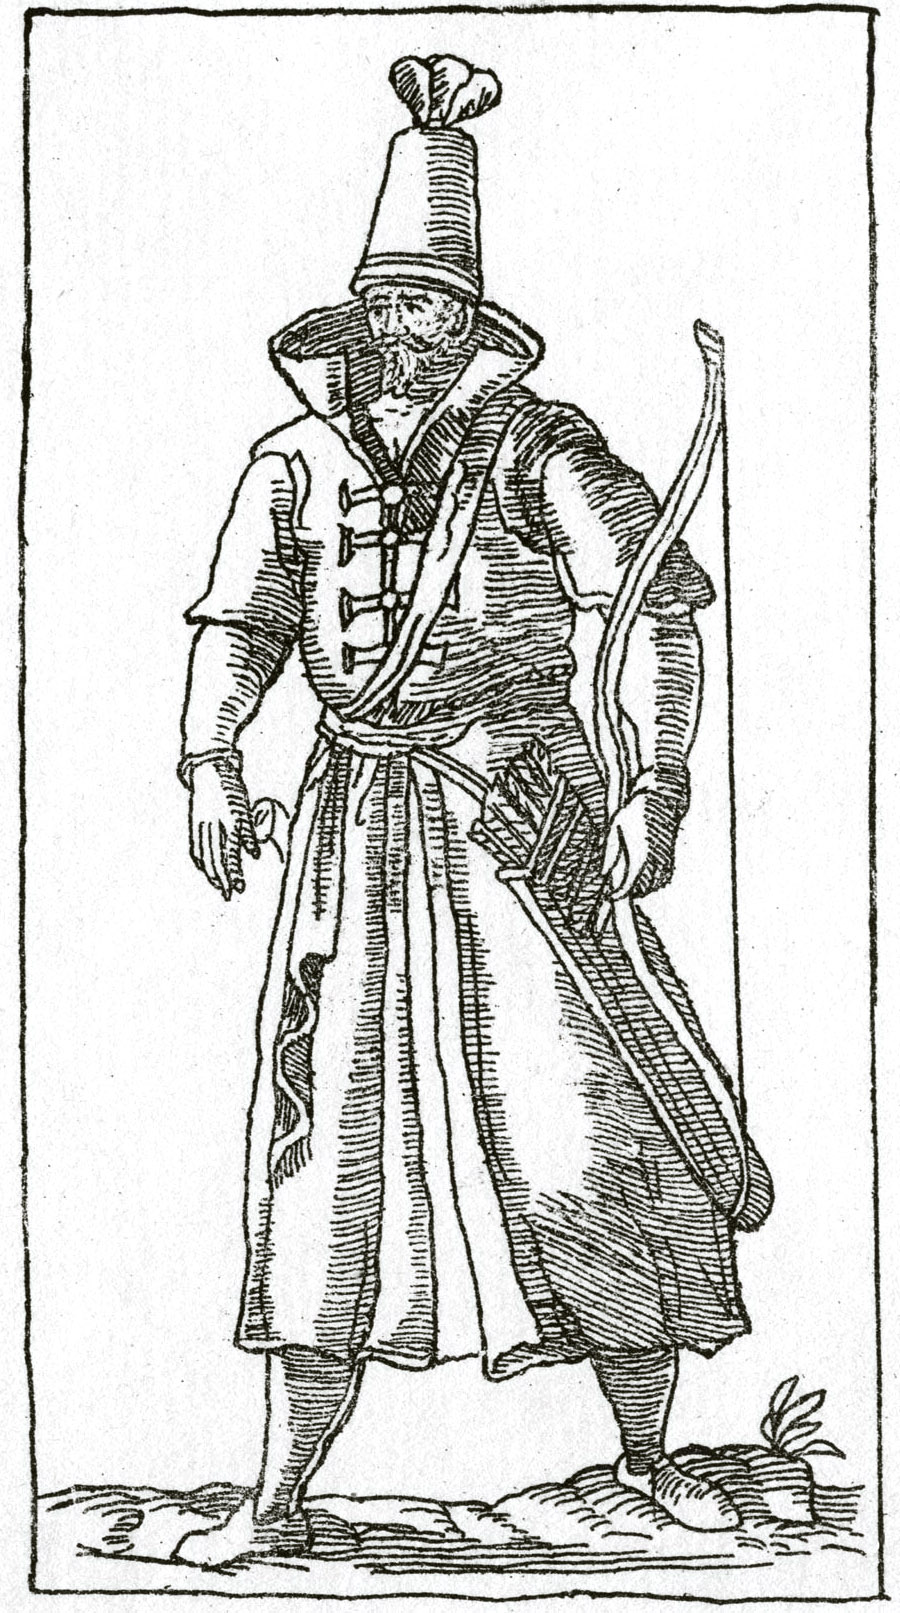 141. Гравюра из книги Чезаре Вечеллио, 1598